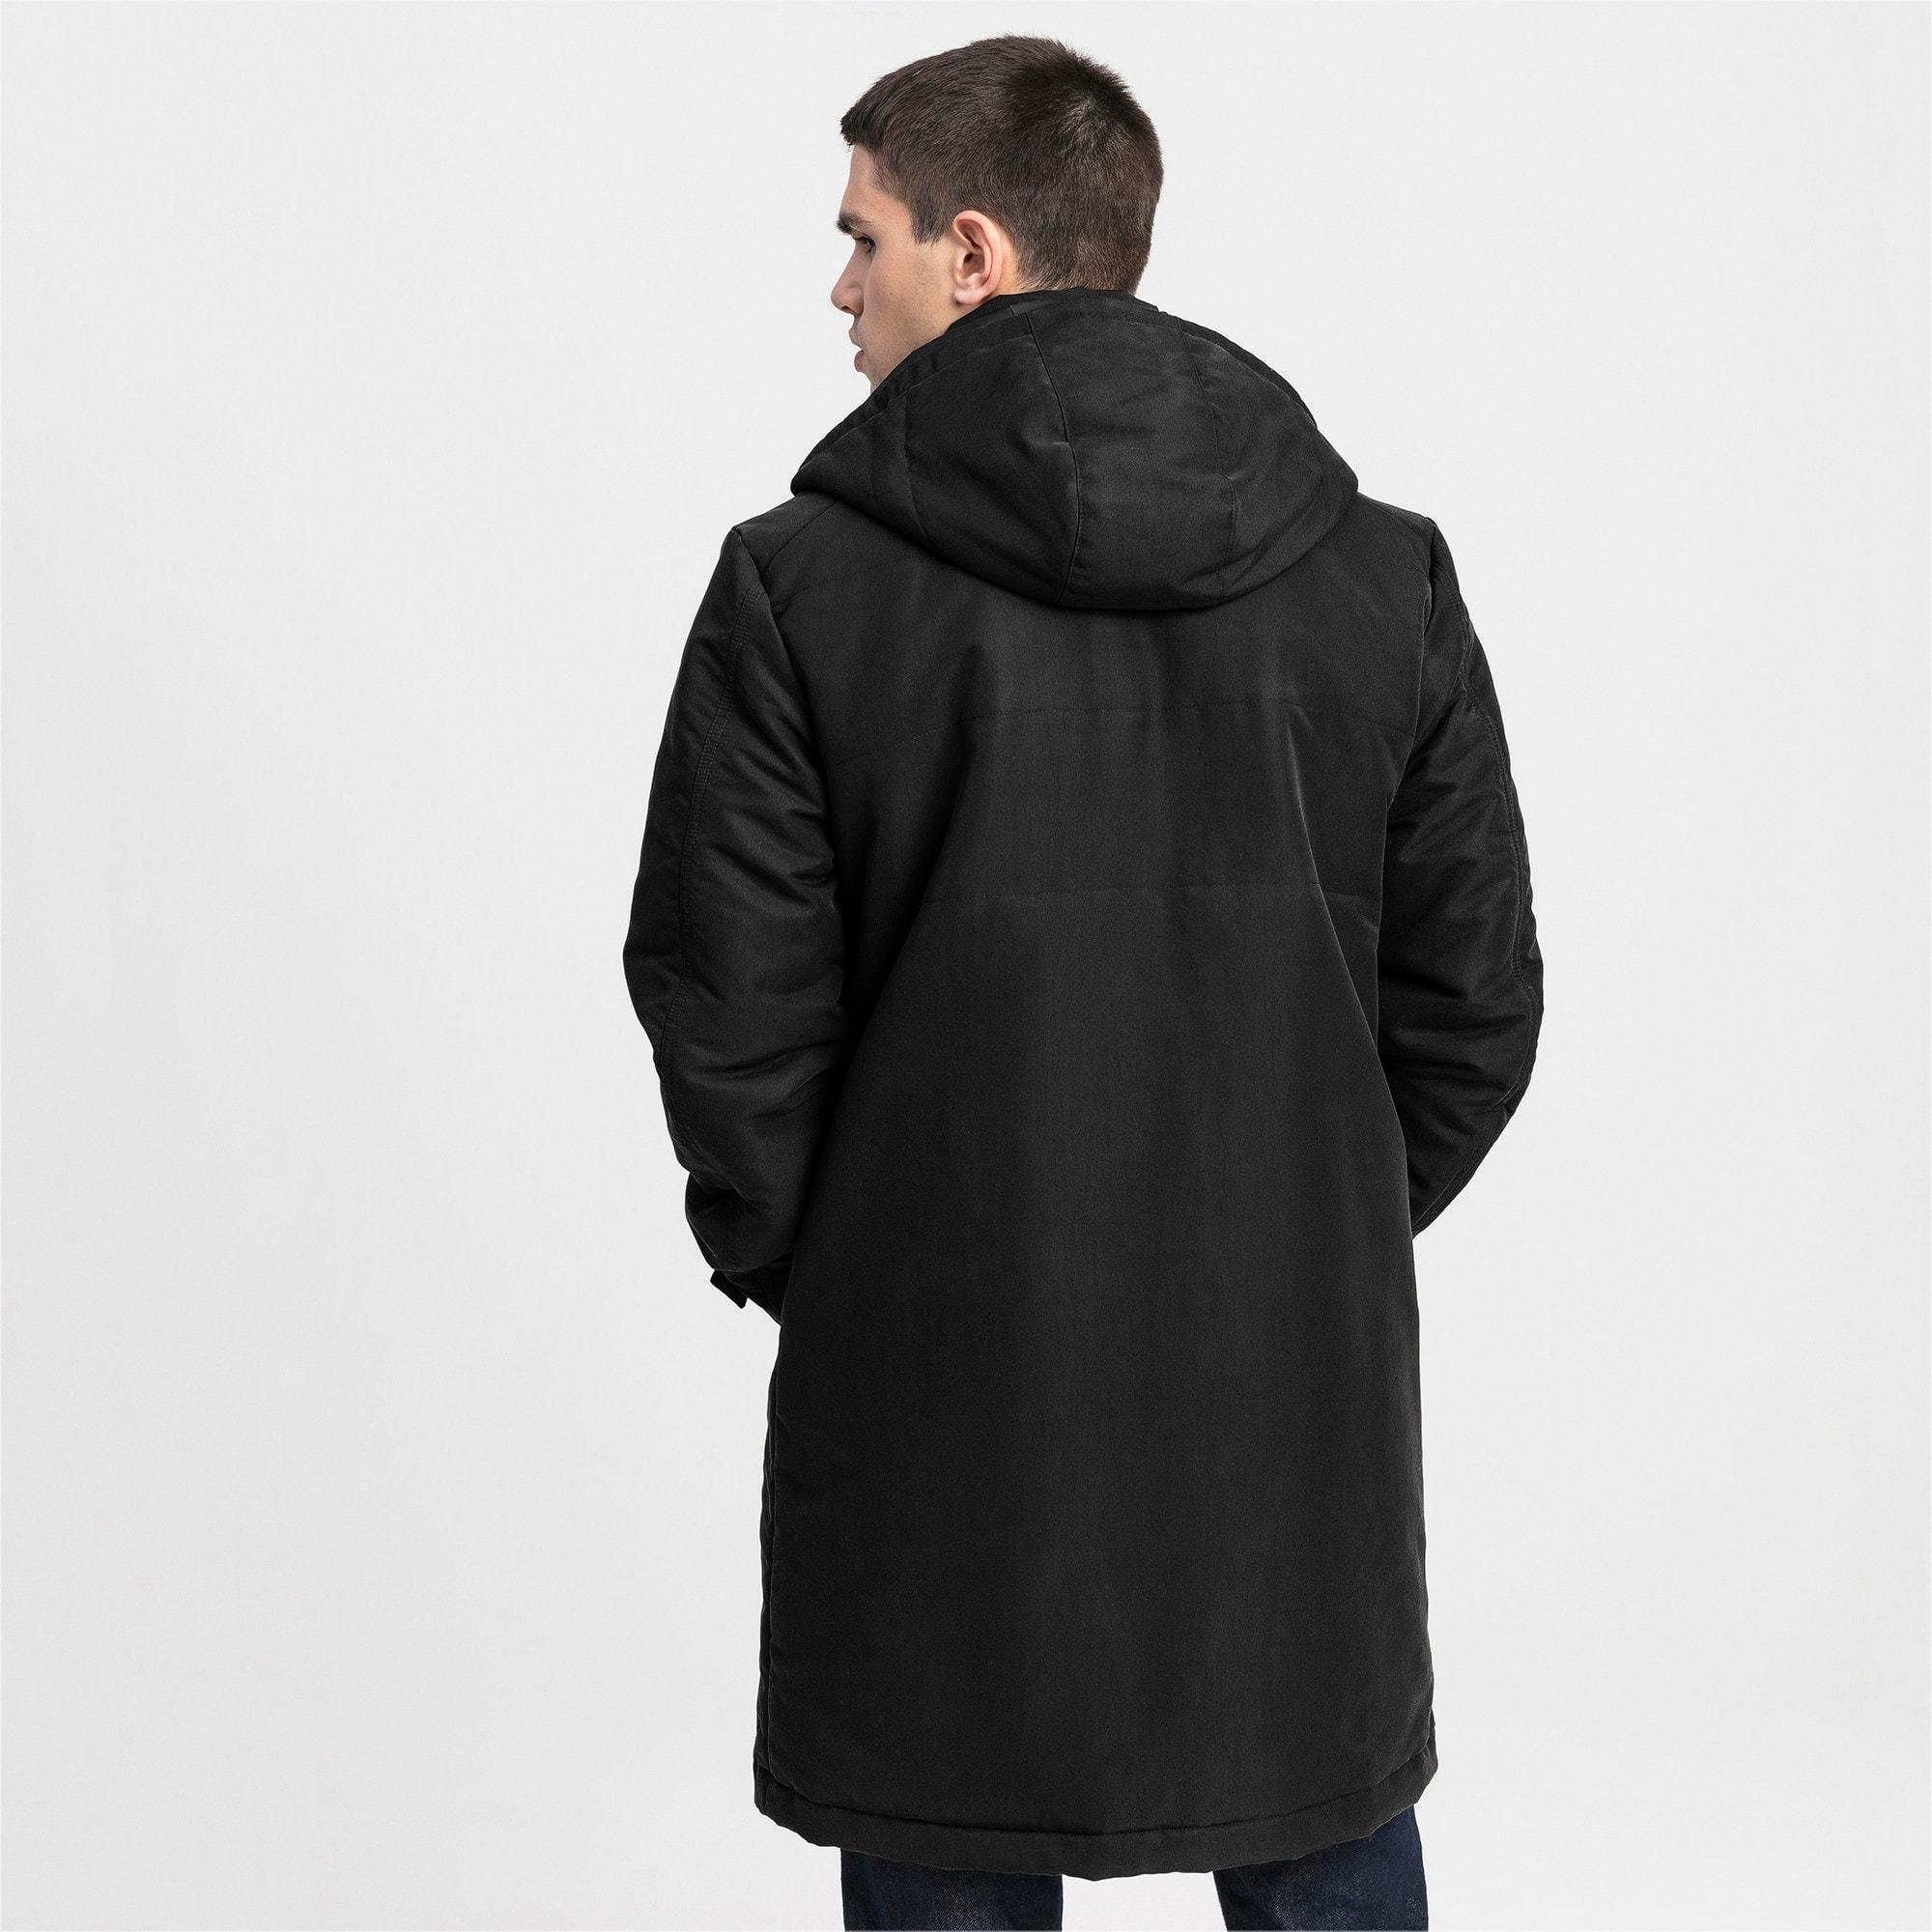 Thumbnail 2 van Ferrari RCT jas voor mannen, Puma Black, medium